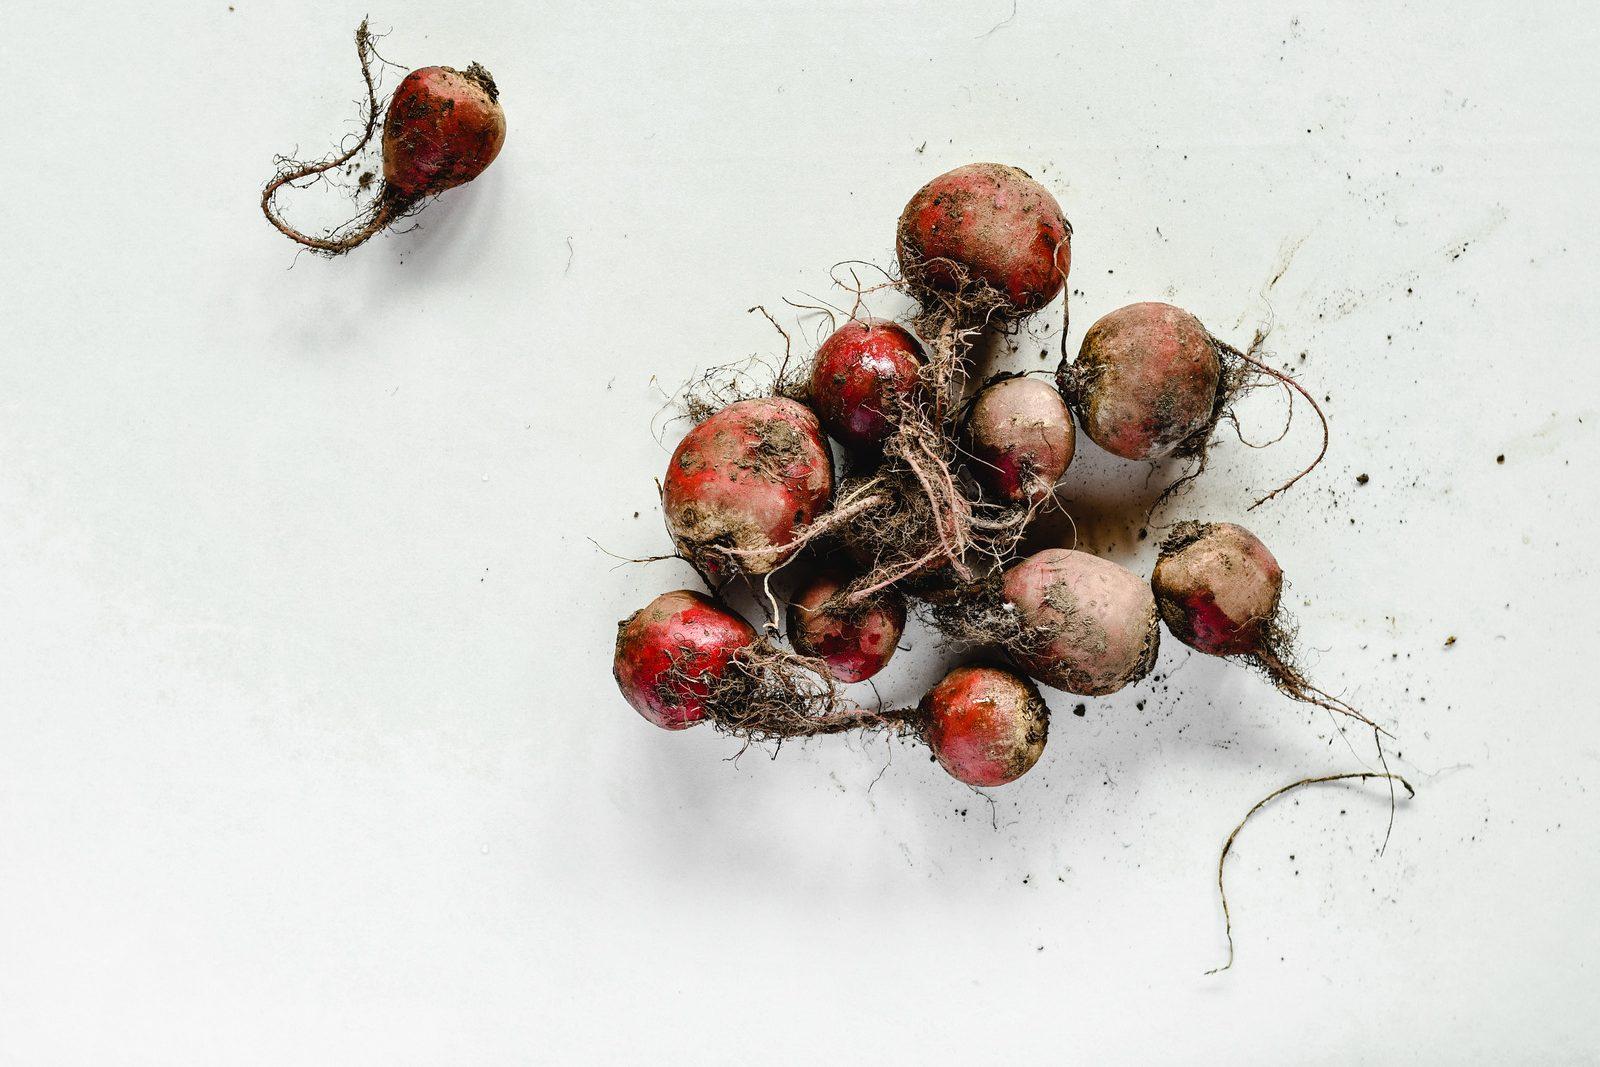 canva-red-round-fruits-on-white-surface-MAEMVOne0QE